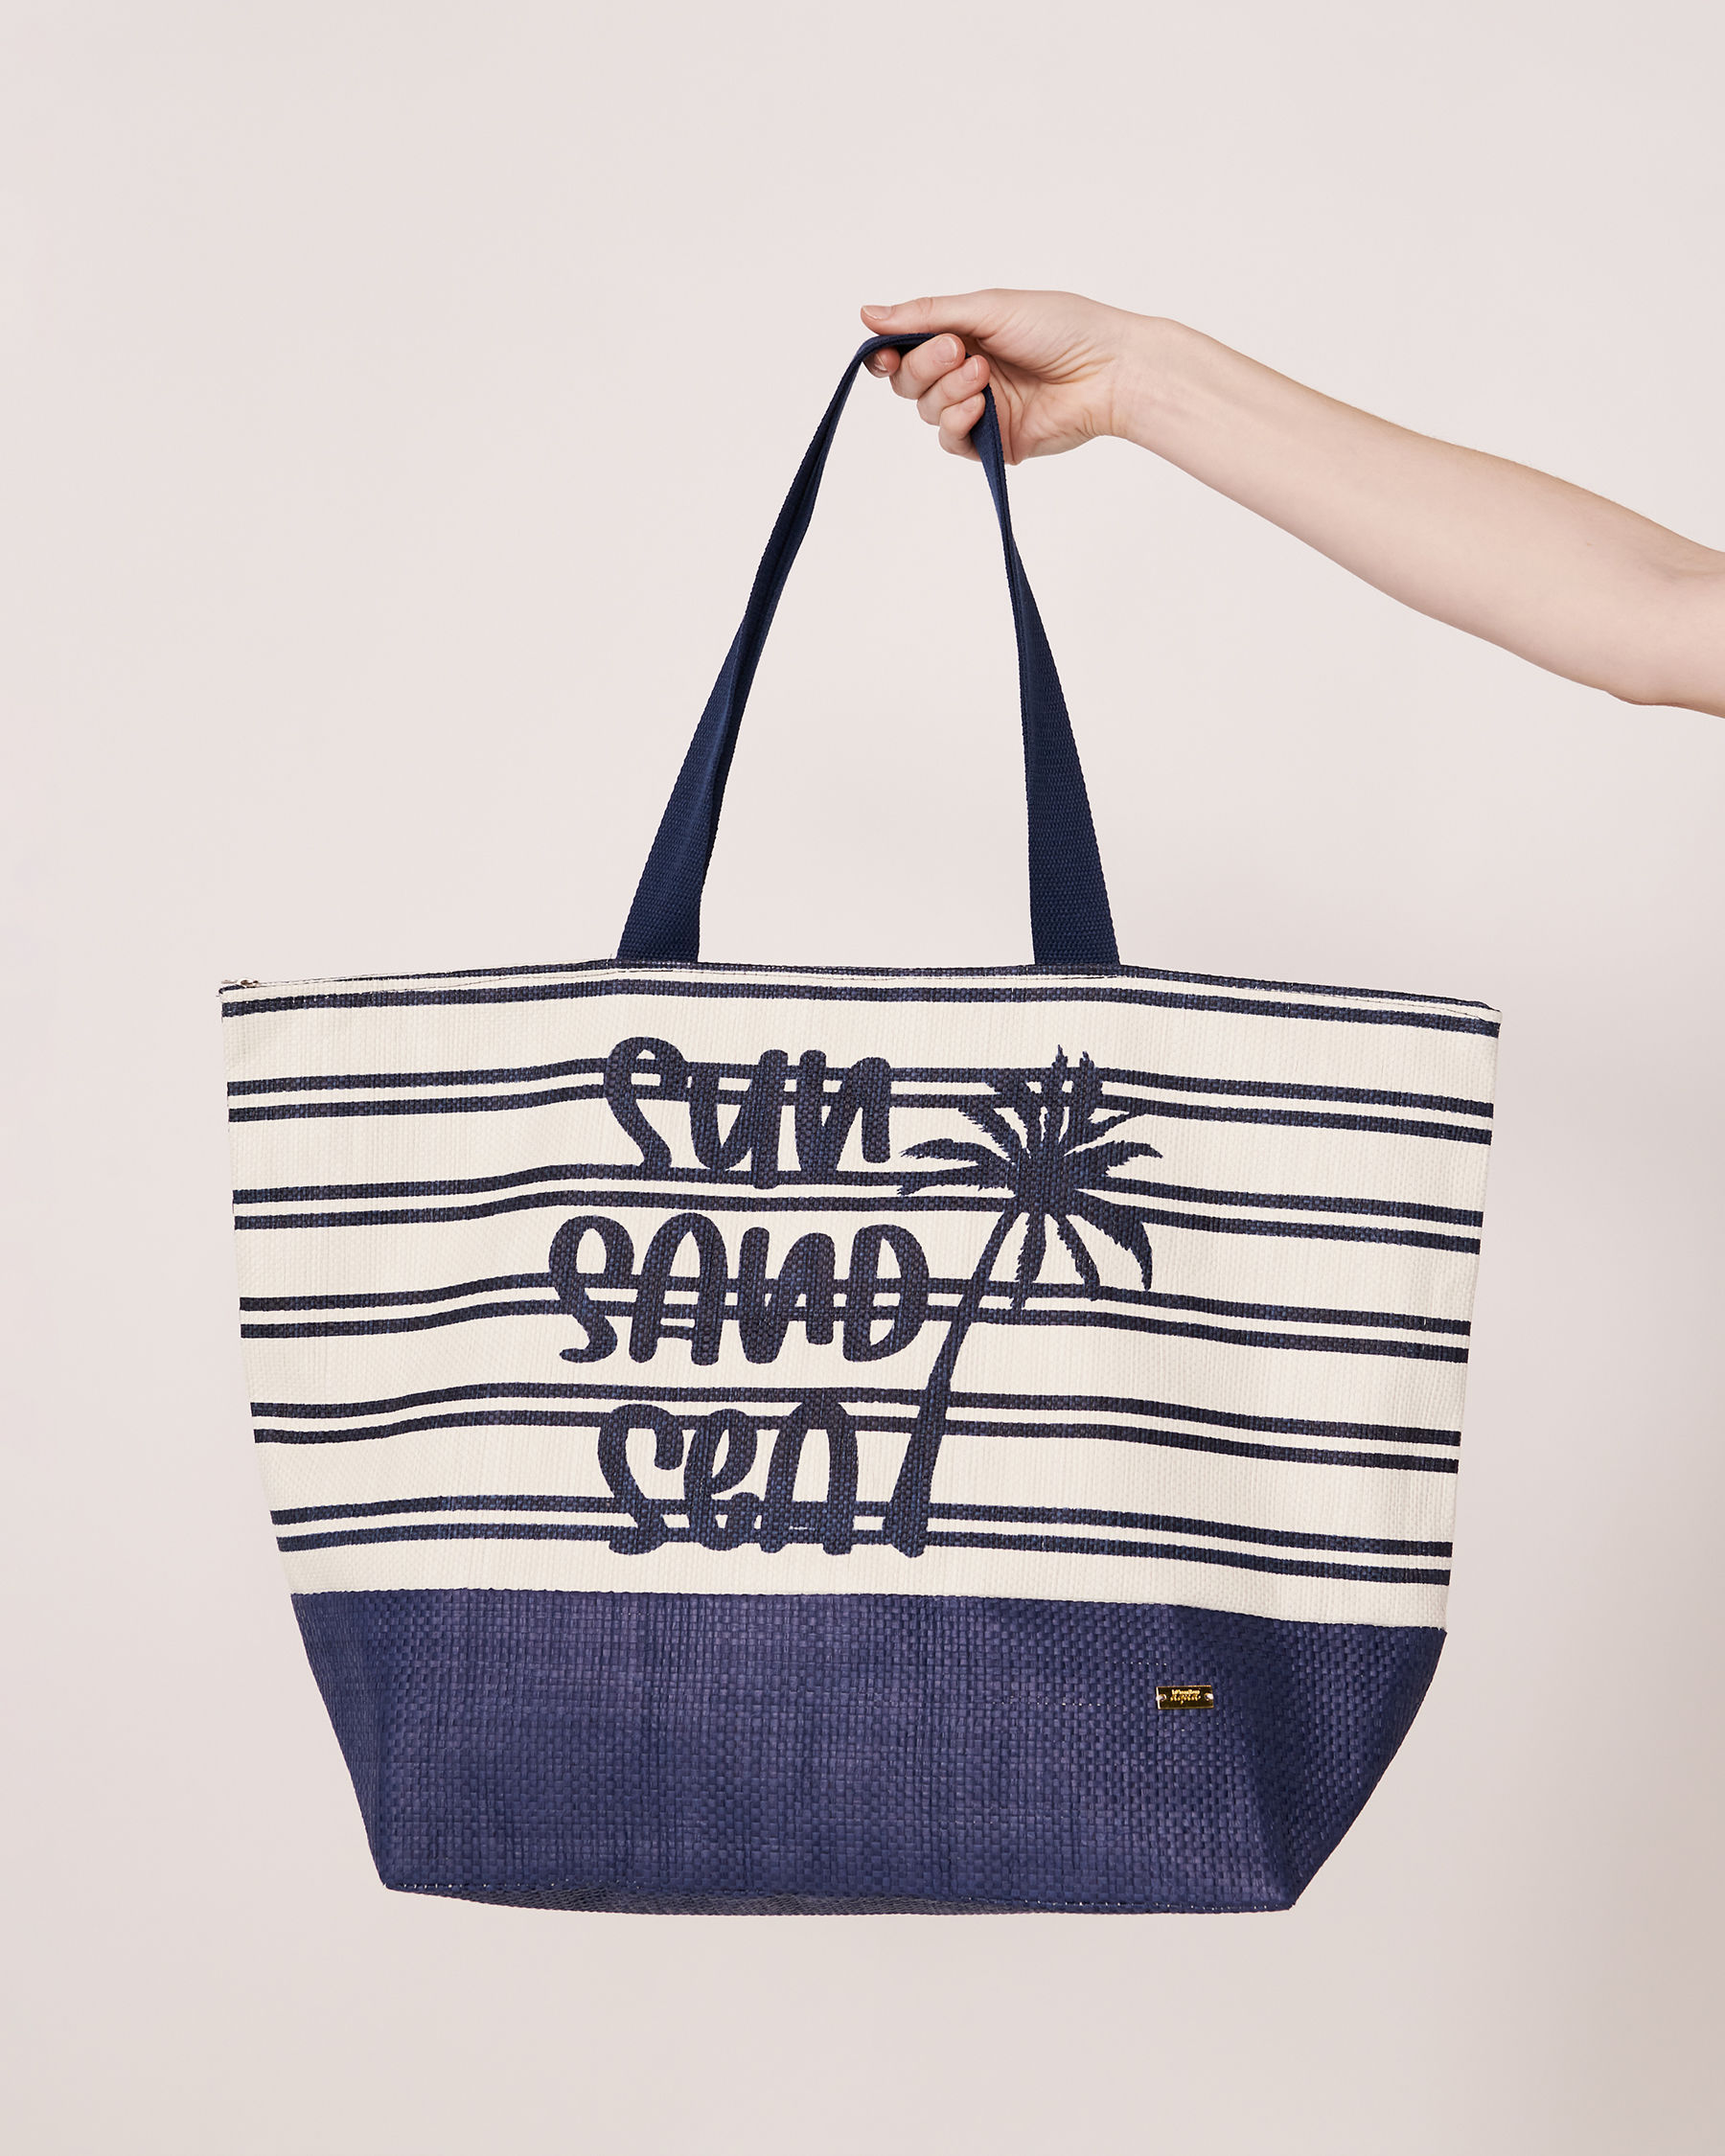 LA VIE EN ROSE AQUA SUN SAND SEA Beach Bag Blue and white stripes 80500010 - View2